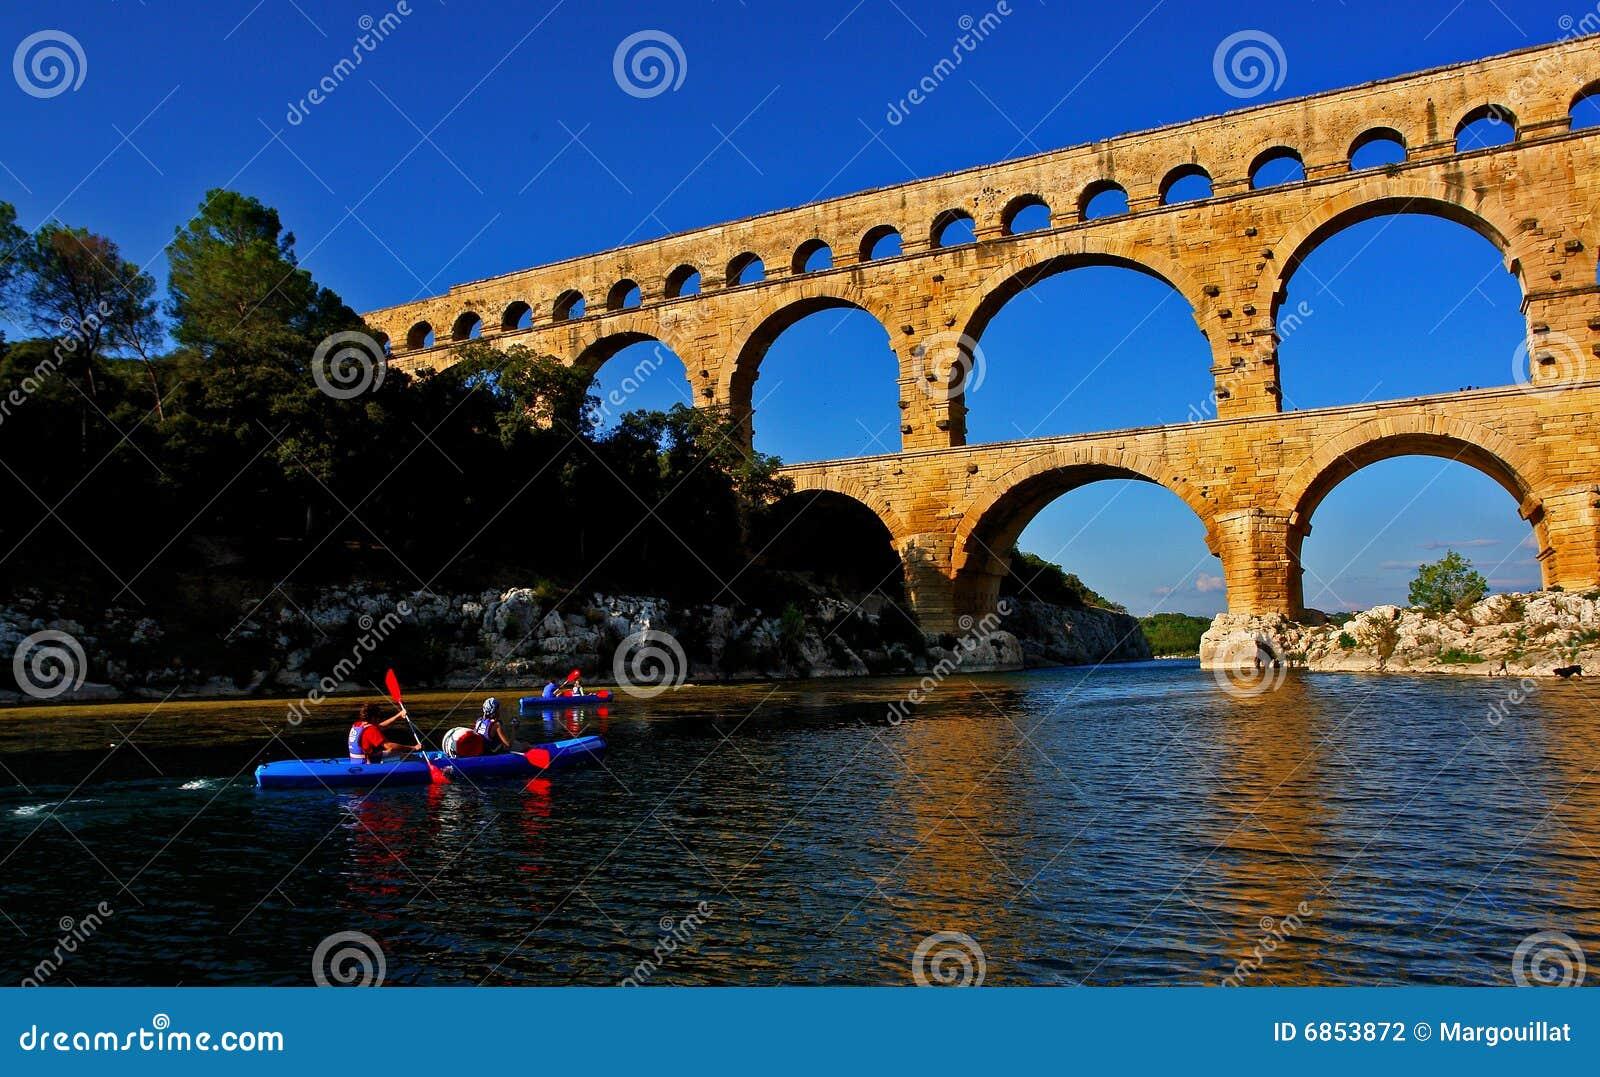 Pont du gard canoeists